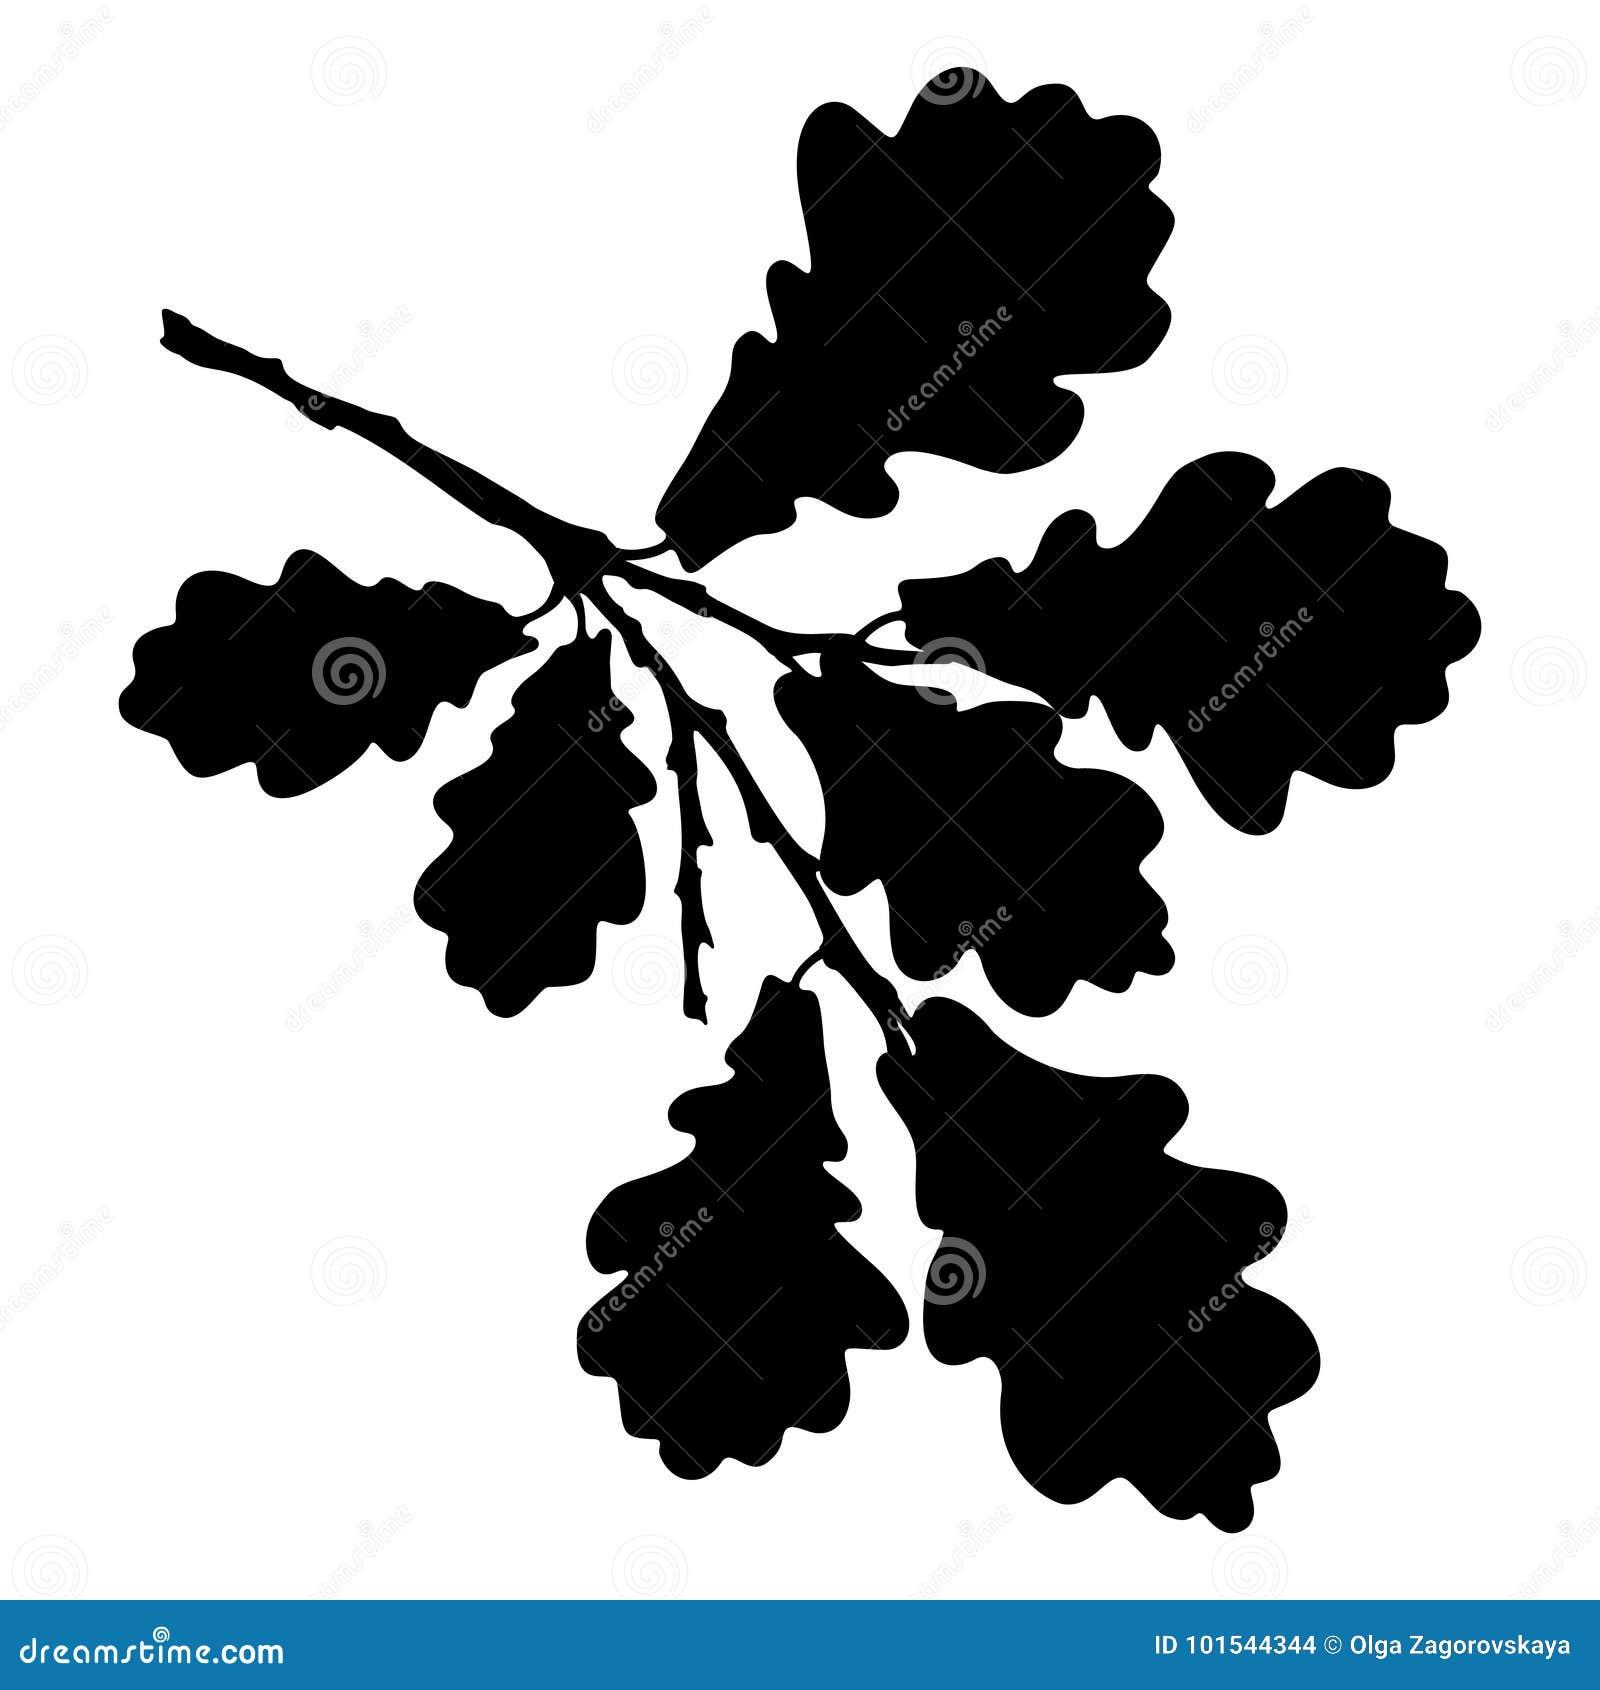 La hoja, la bellota y la rama del roble aislaron la silueta, ecología estilizada